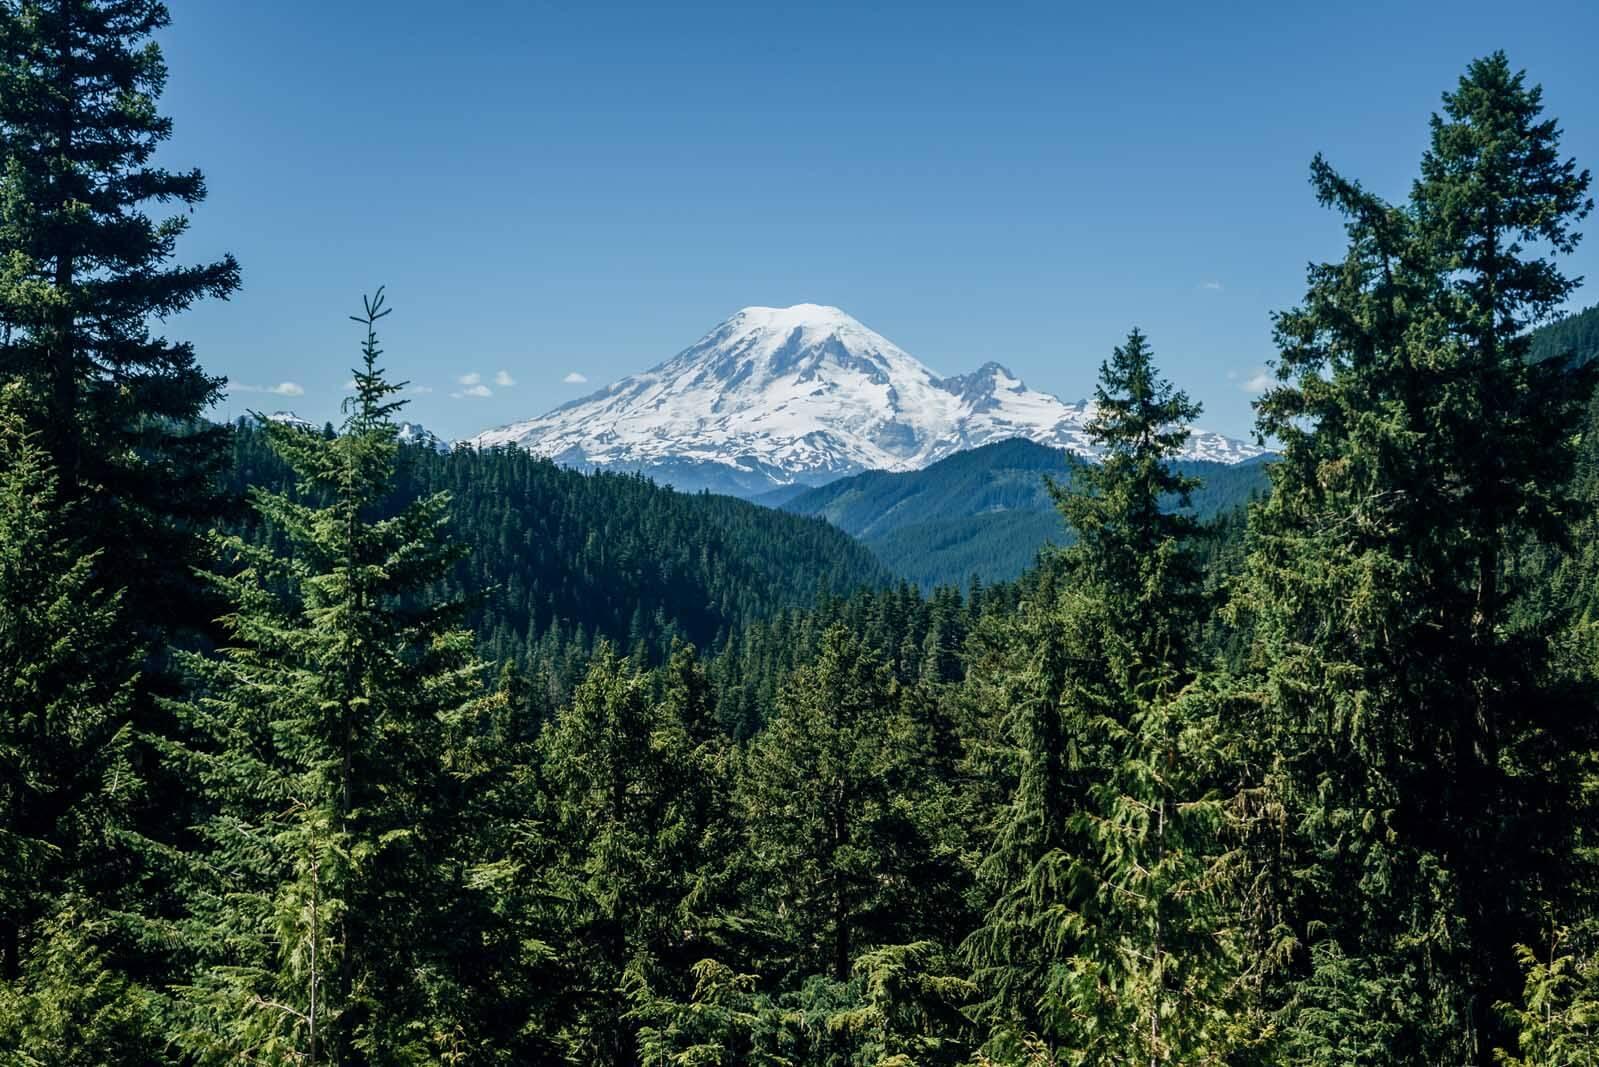 Amazing view of Mt. Rainer from White Pass